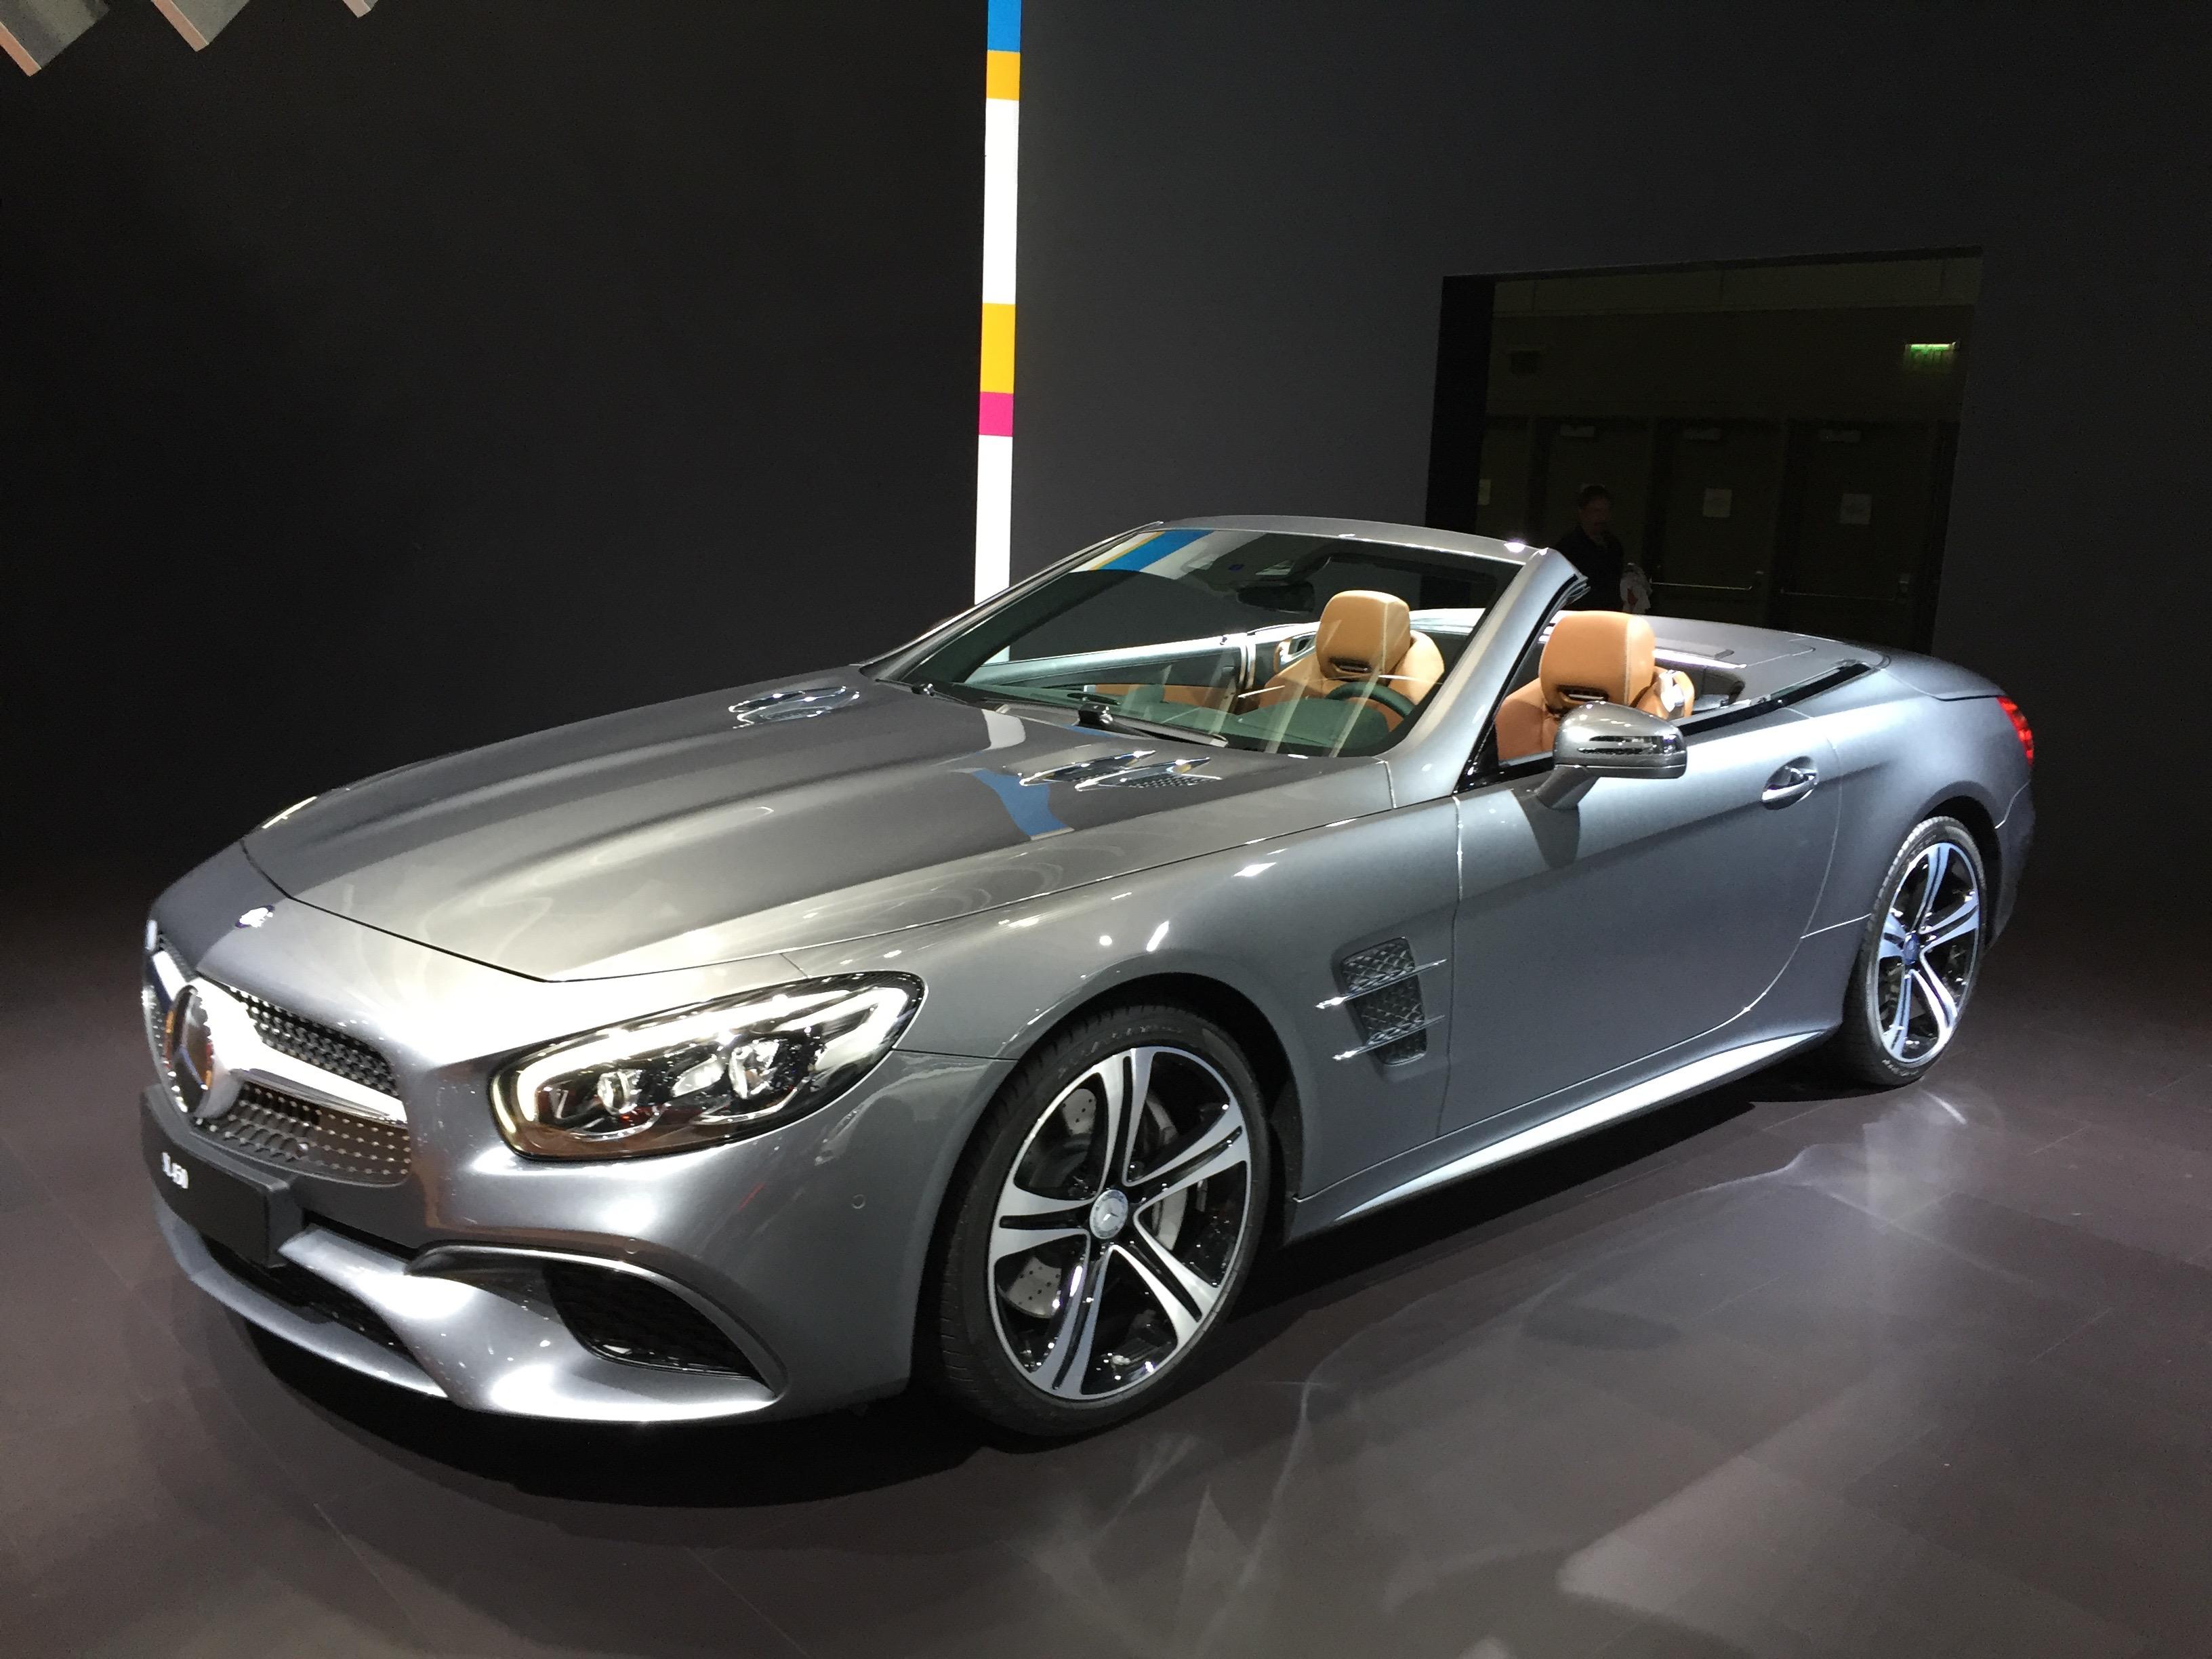 2017 Mercedes-Benz SL Gets Svelte New Look, Nine-Speed Gearbox: Video